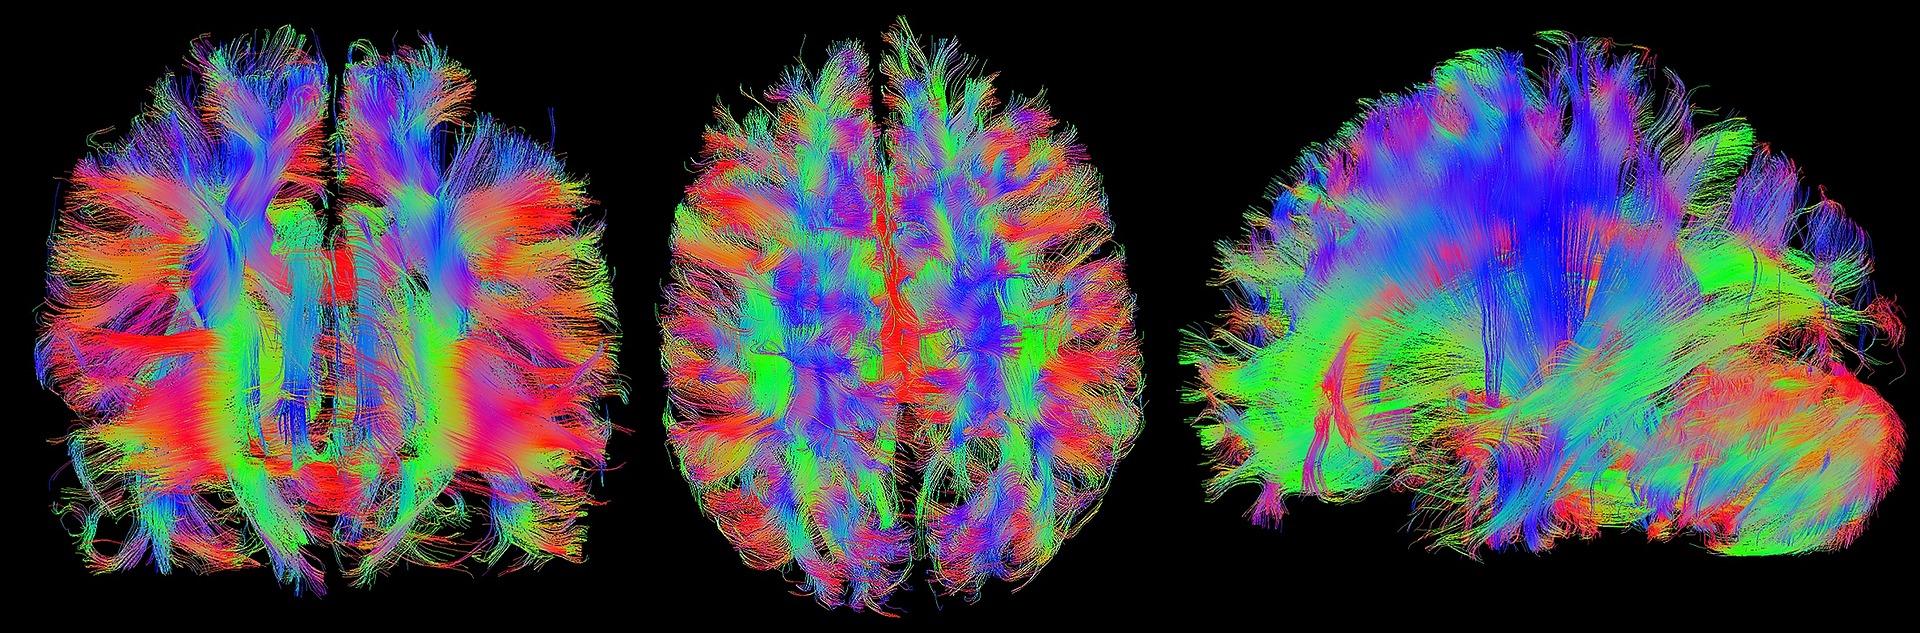 brain-1728449_1920